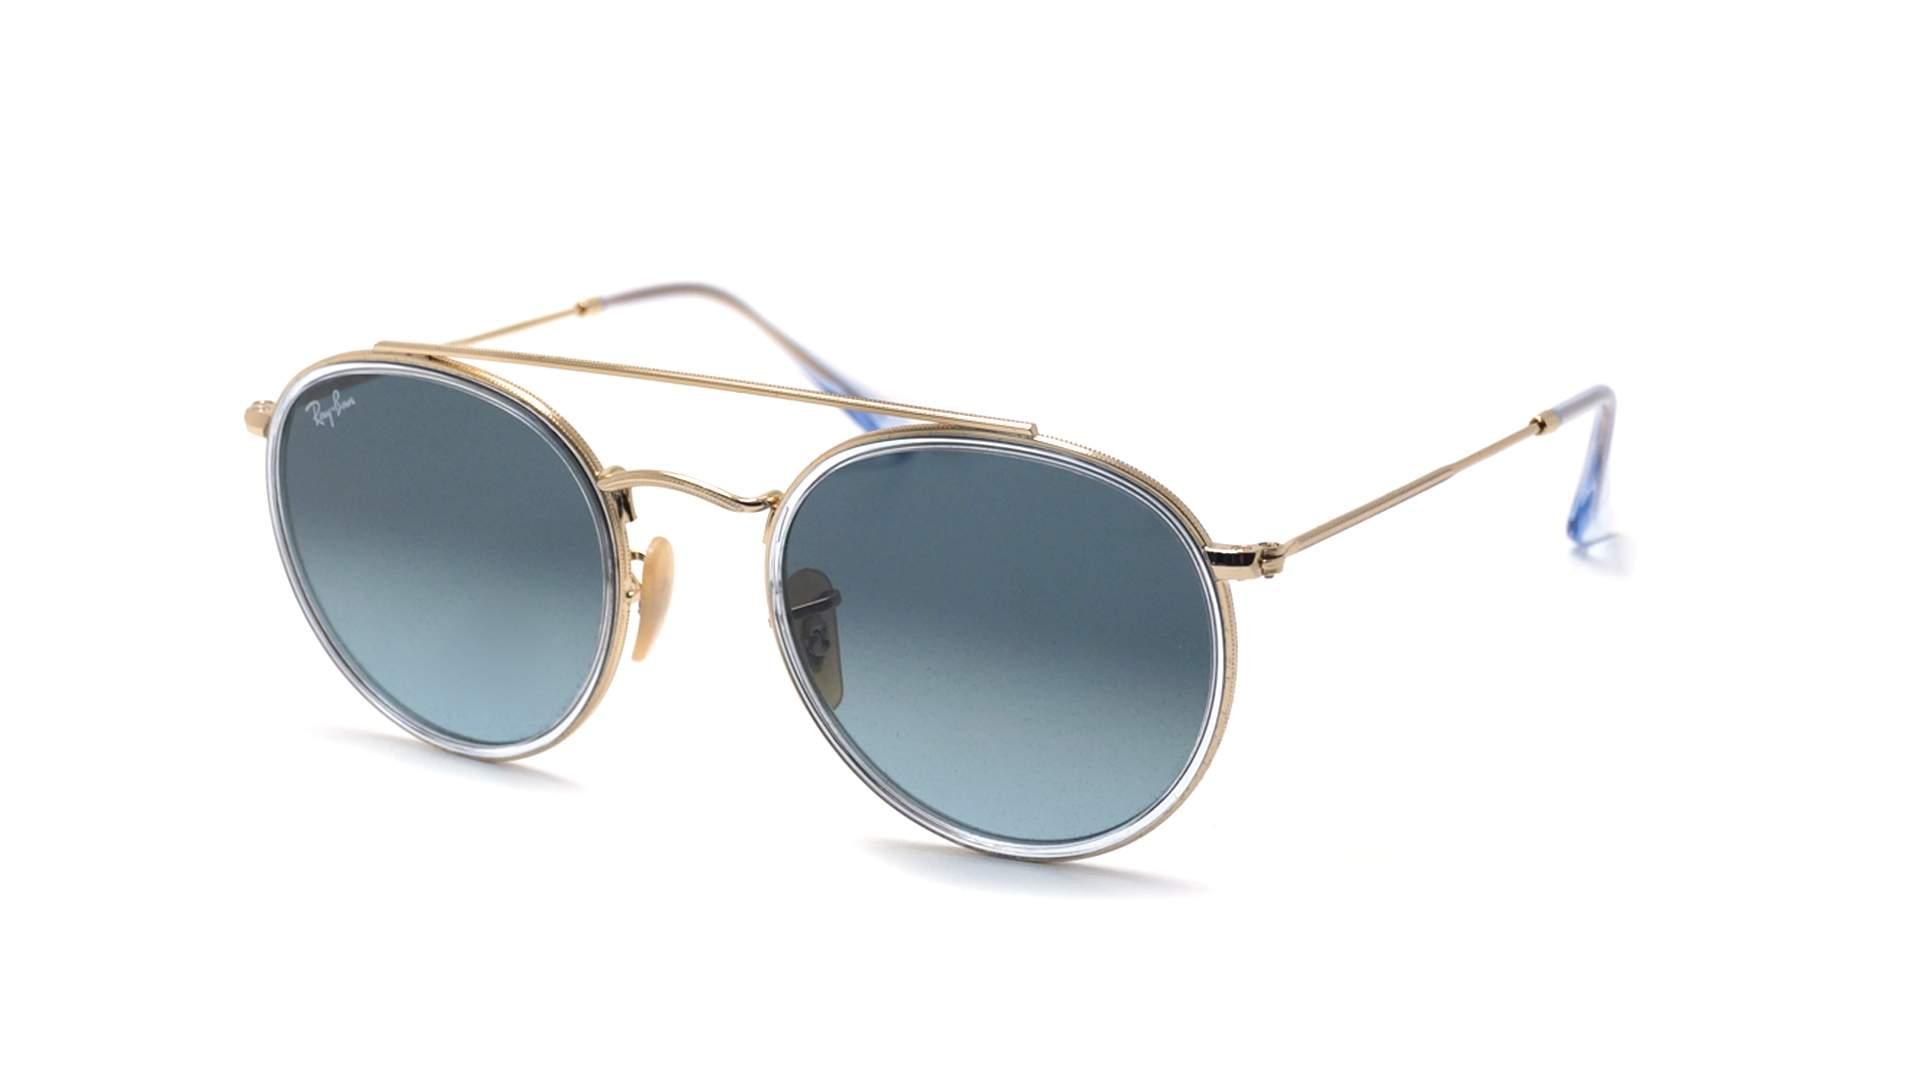 adae3ee794b7e Sunglasses Ray-Ban Round Double Bridge Silver RB3647N 91233M 51-22 Medium  Gradient